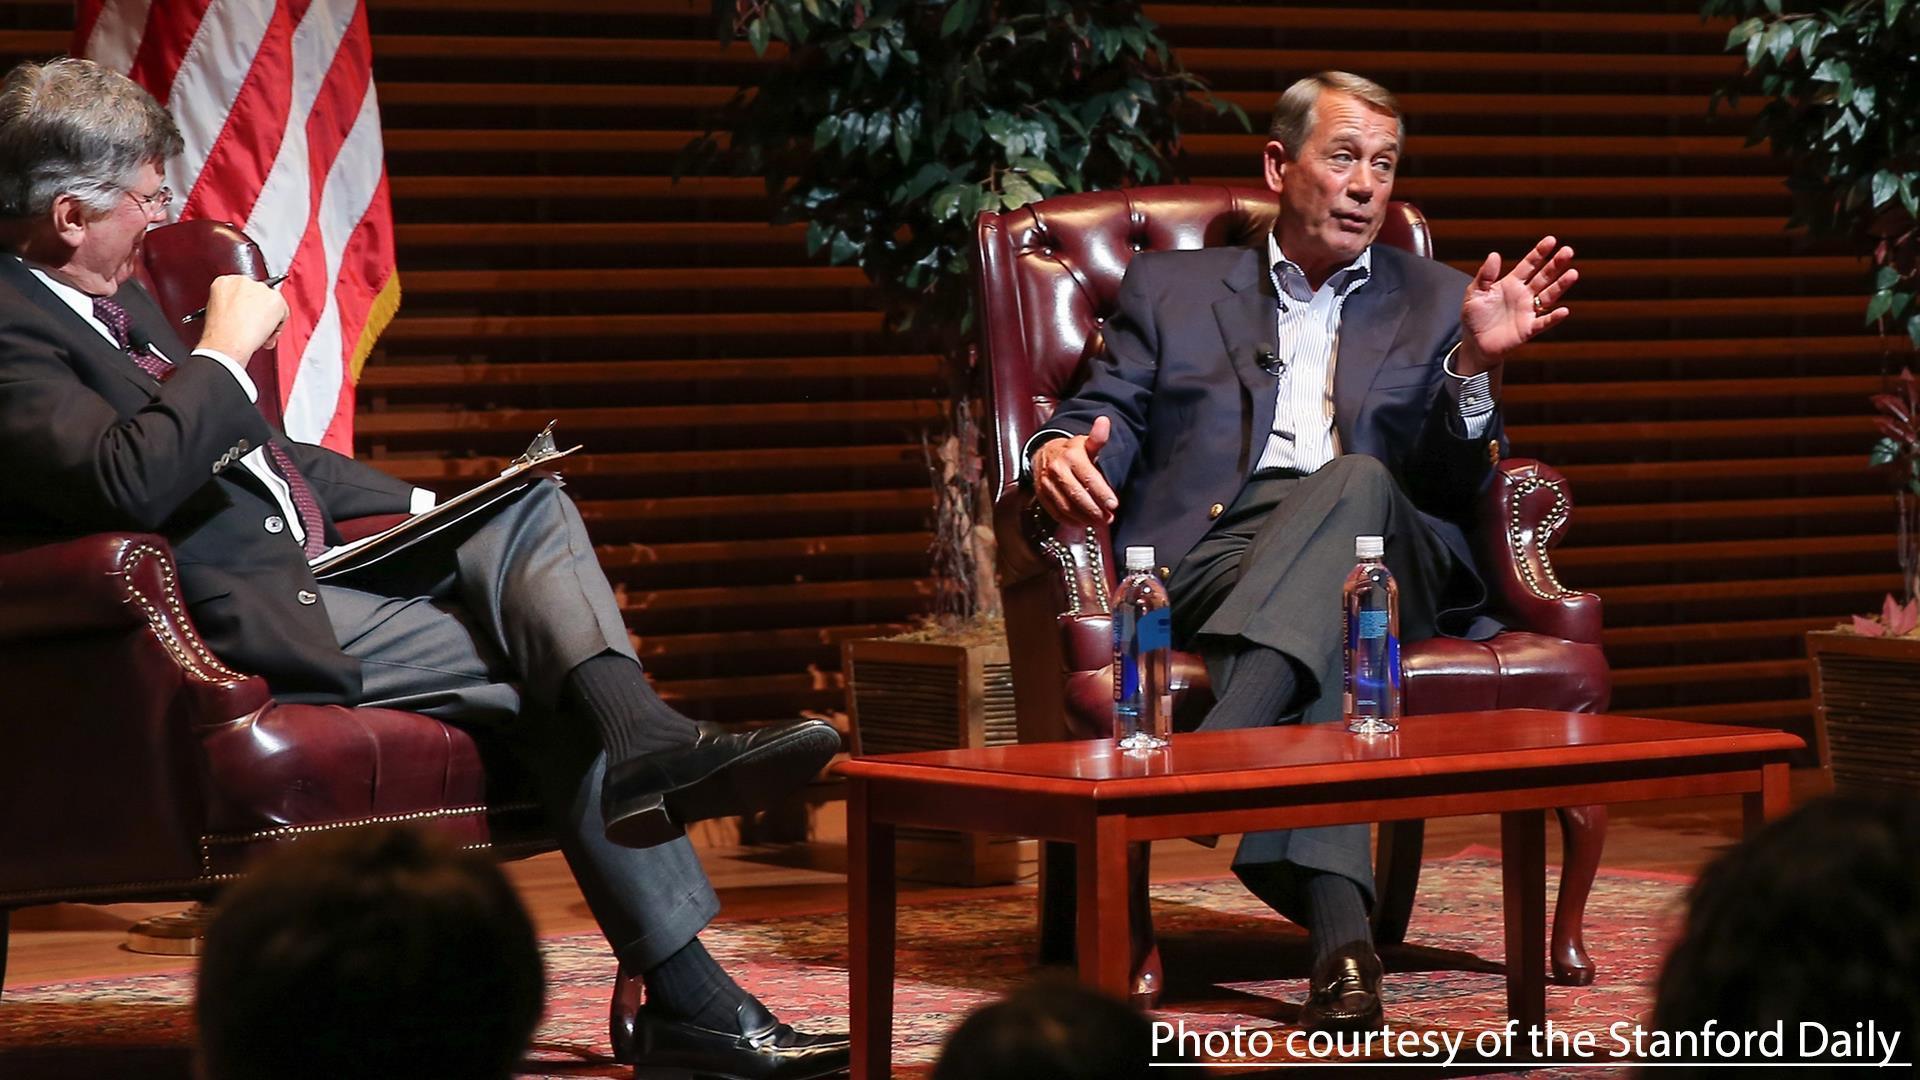 Listen to John Boehner Call Ted Cruz 'Lucifer'